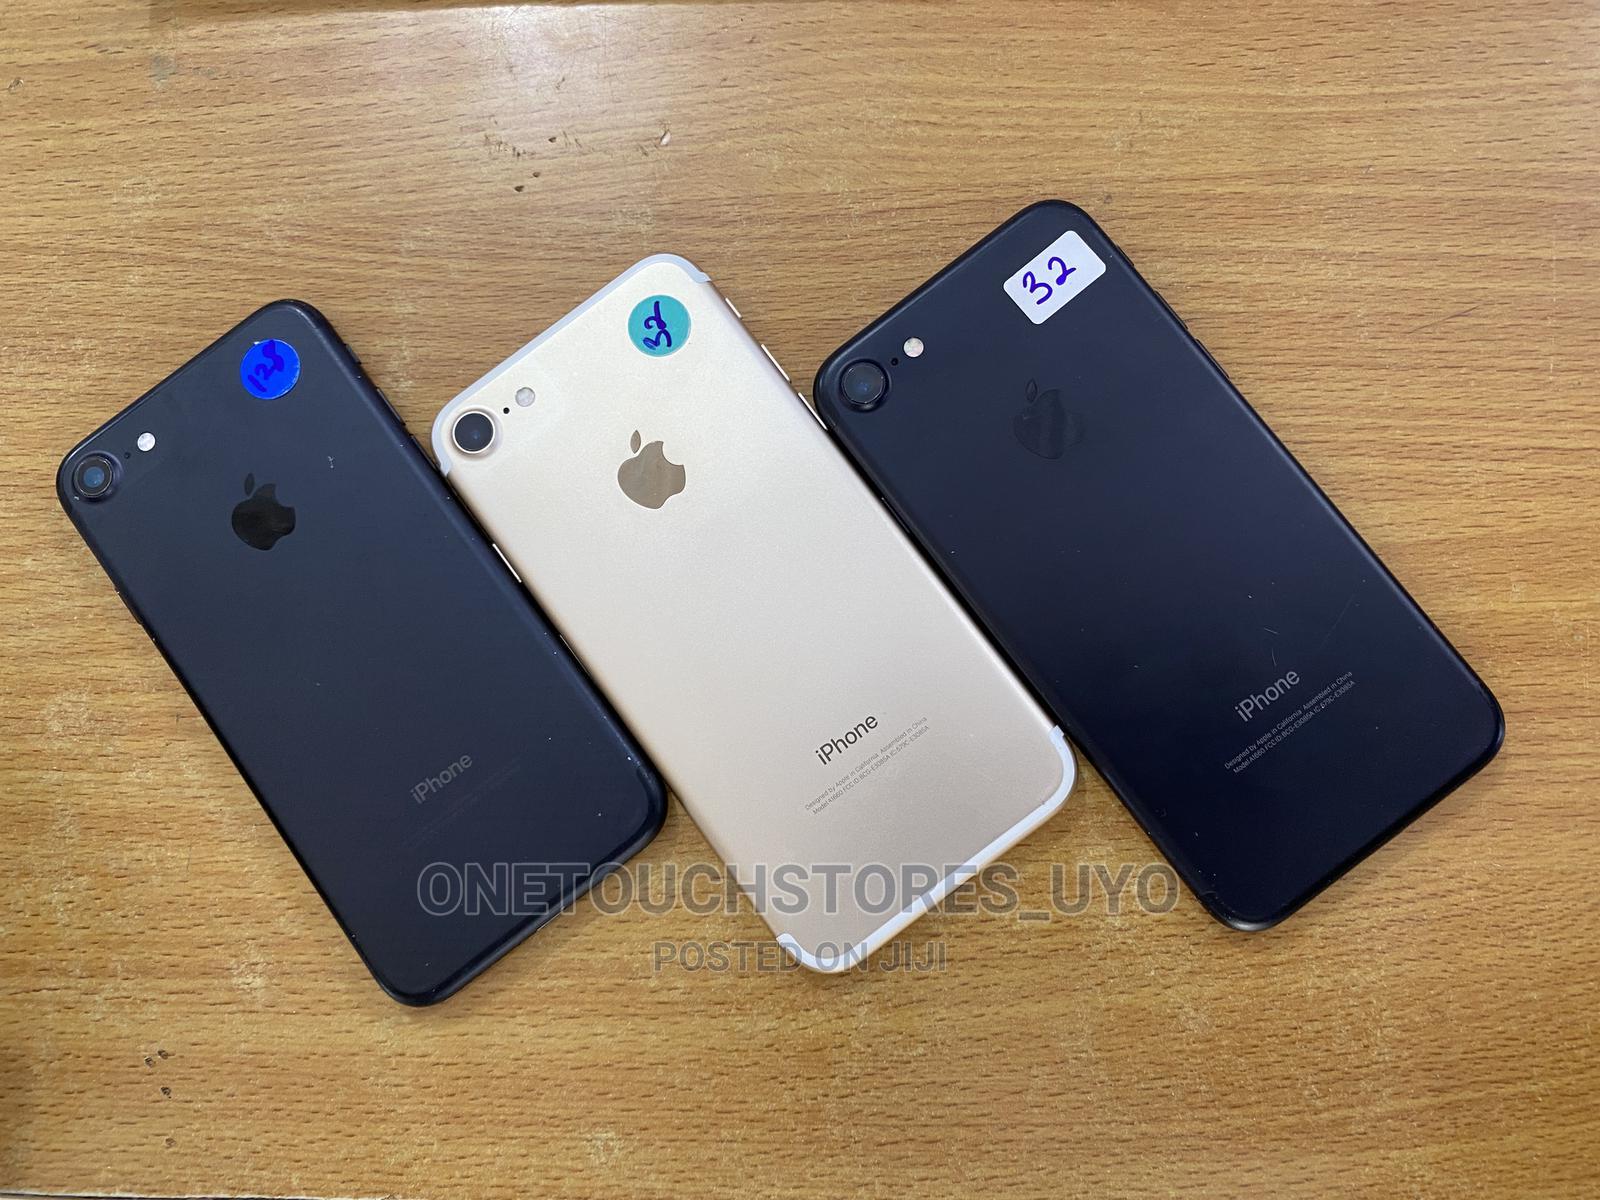 Apple iPhone 7 32 GB Black | Mobile Phones for sale in Uyo, Akwa Ibom State, Nigeria